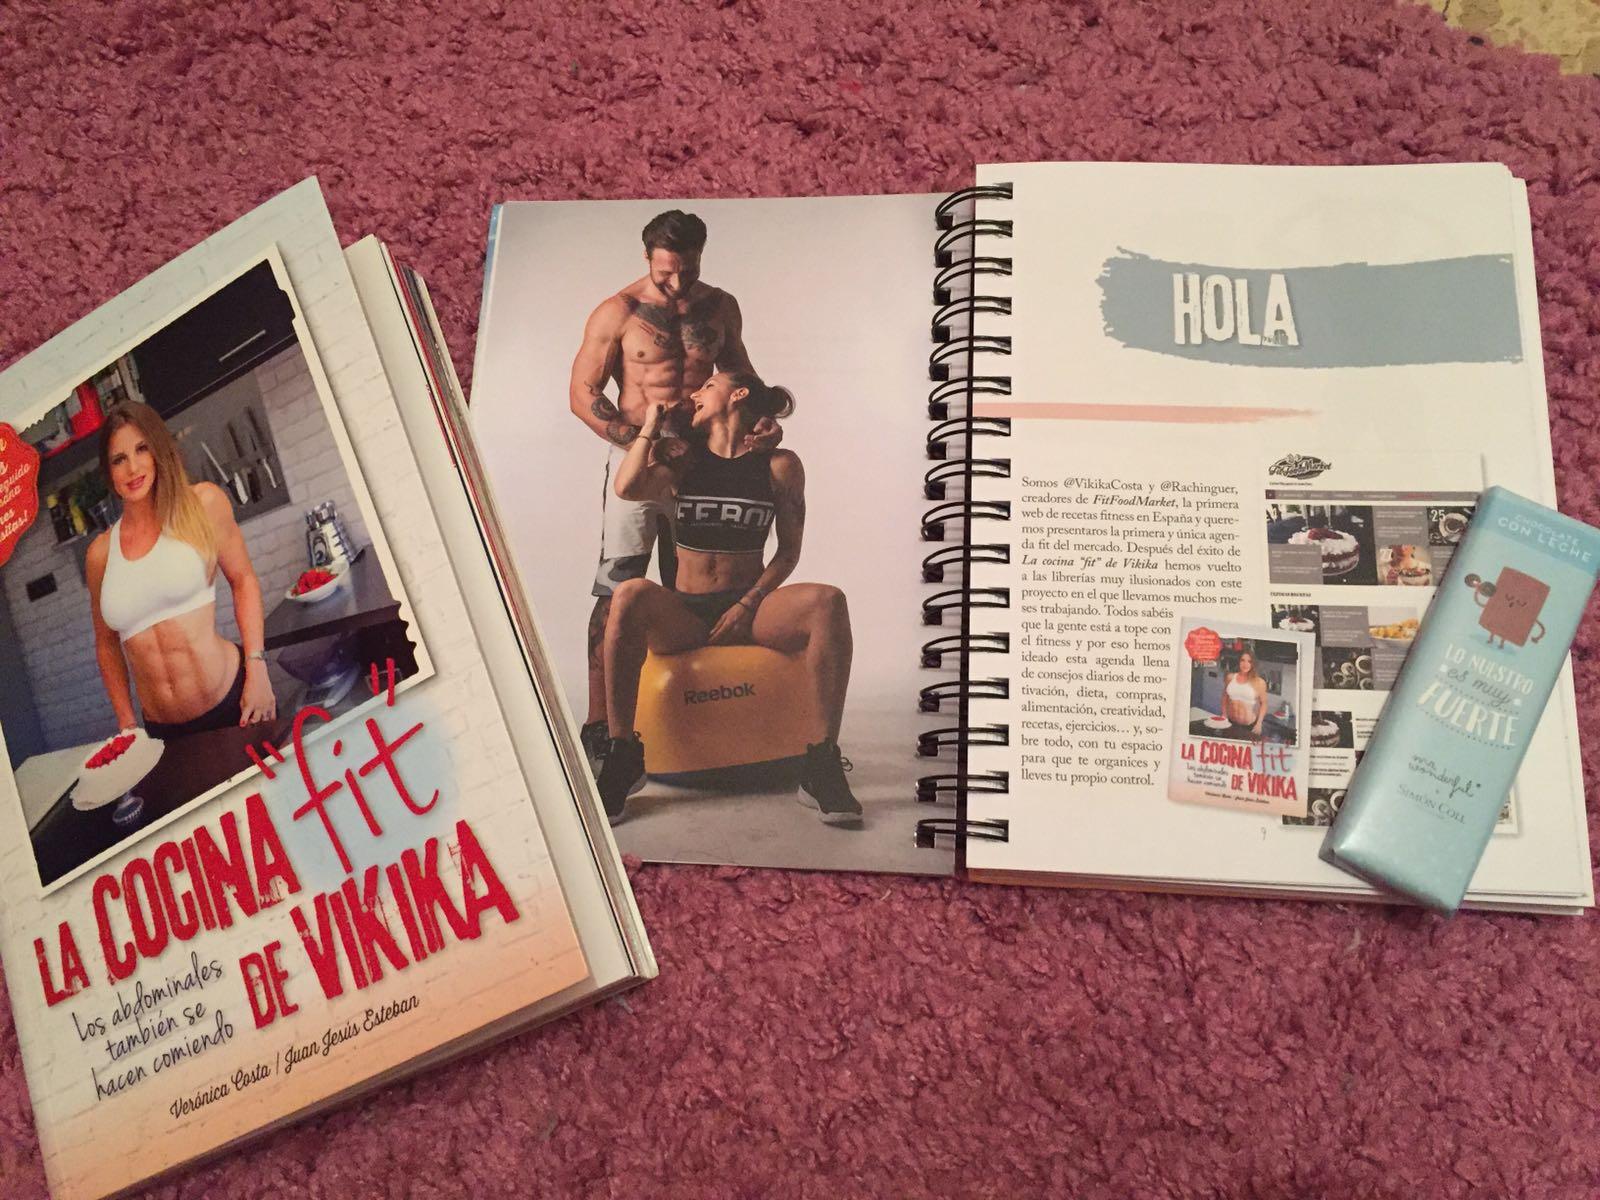 Te deseo un libro agenda fit be fitfoodmarket 201 - La cocina fit de vikika pdf ...